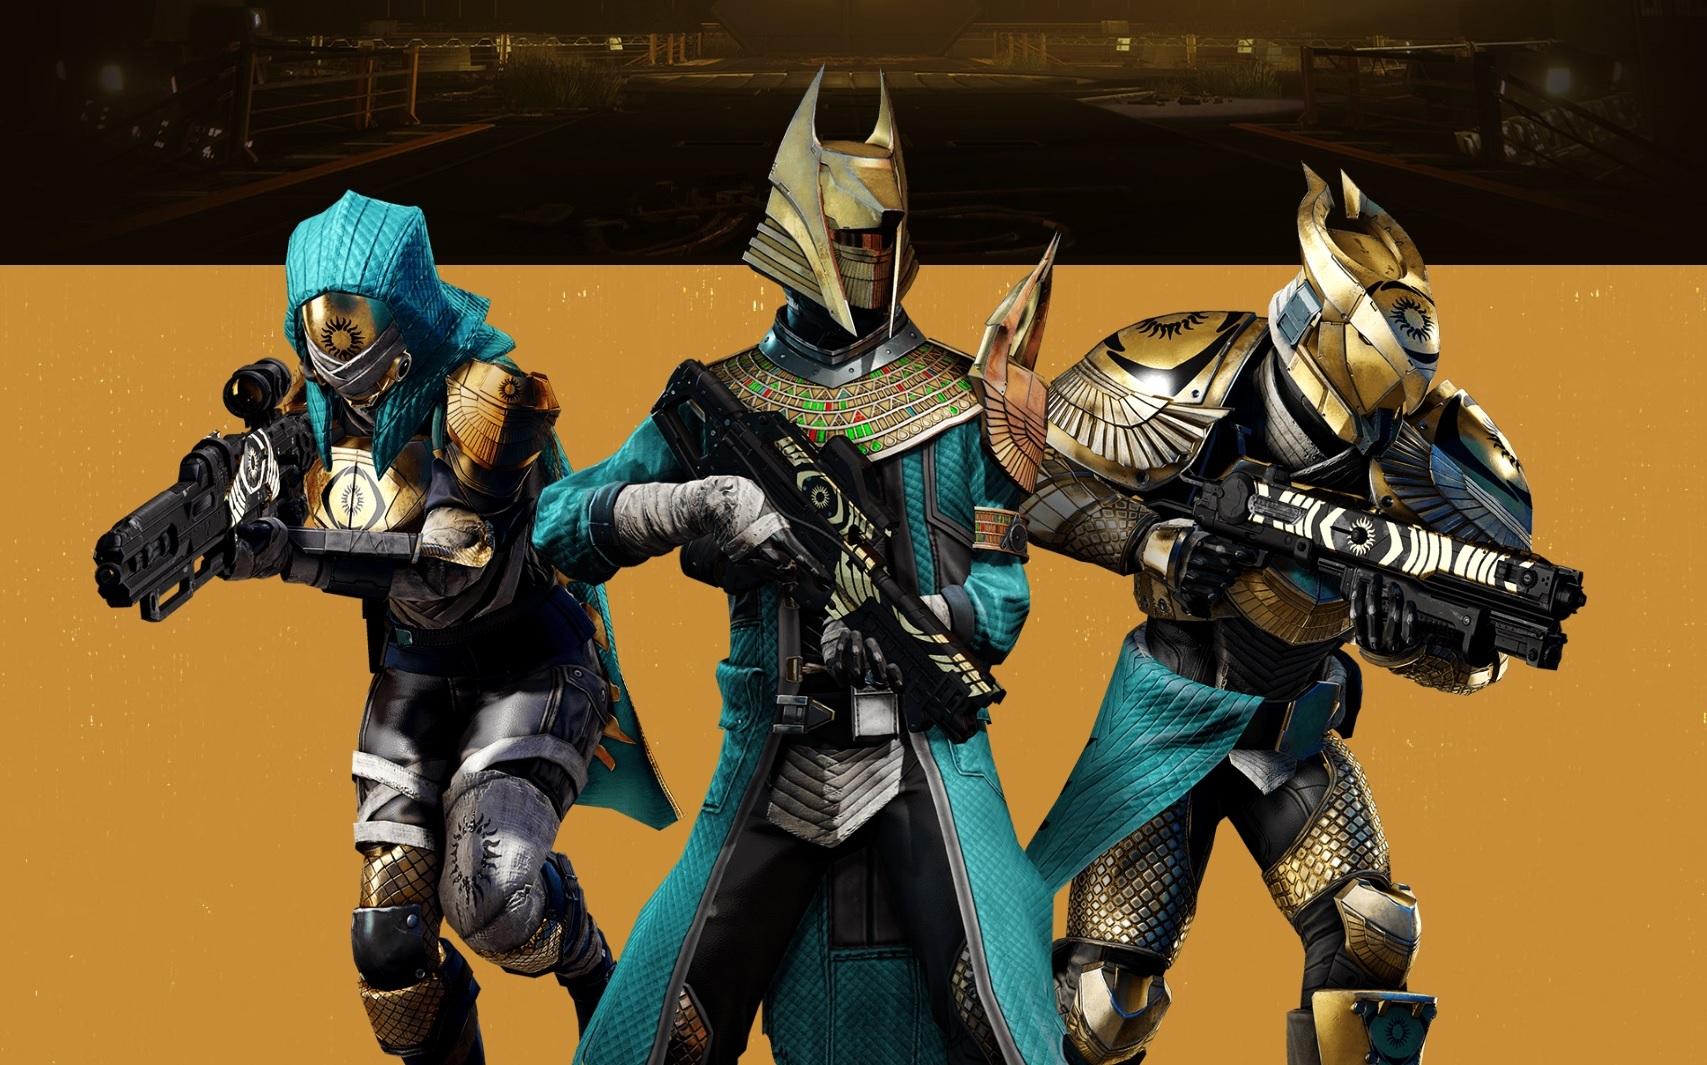 Destiny 2's Trials of Osiris mode has imploded again screenshot